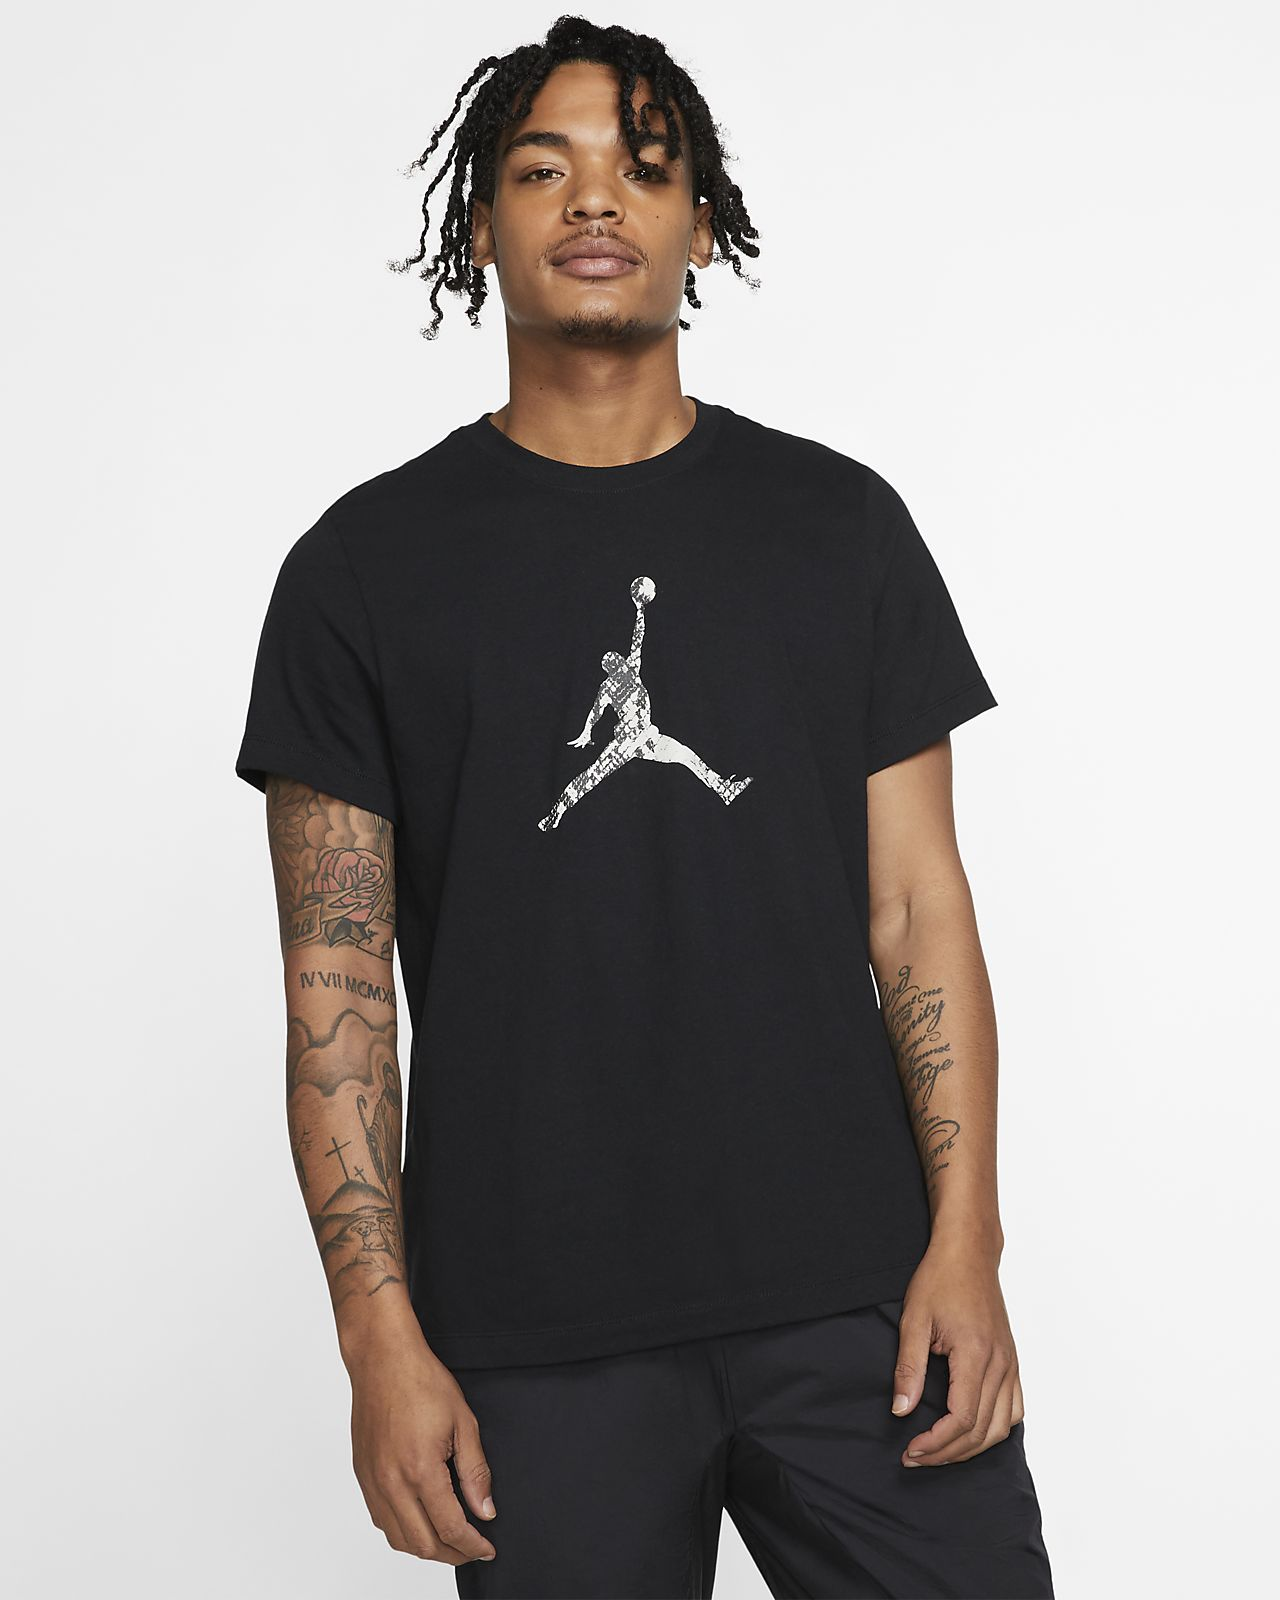 db058300a57 Jordan Legacy AJ11 Snakeskin Men's T-Shirt. Nike.com